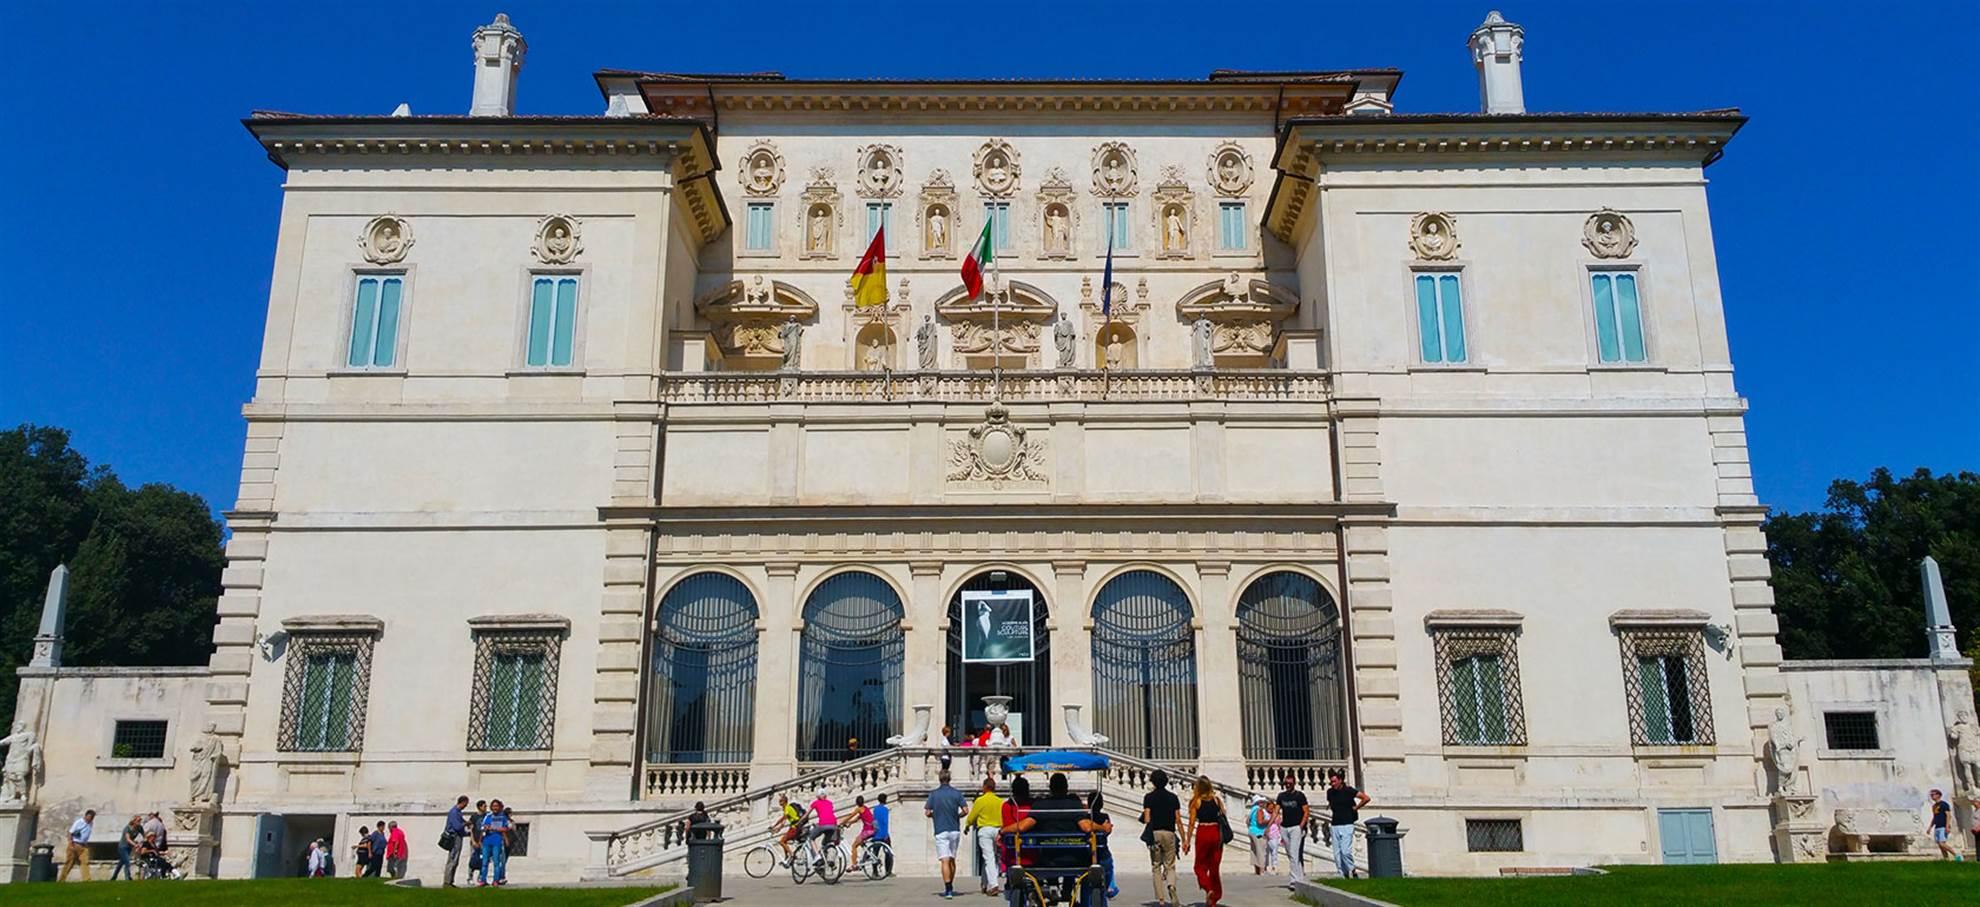 Galeria Borghese  - Evite a fila!